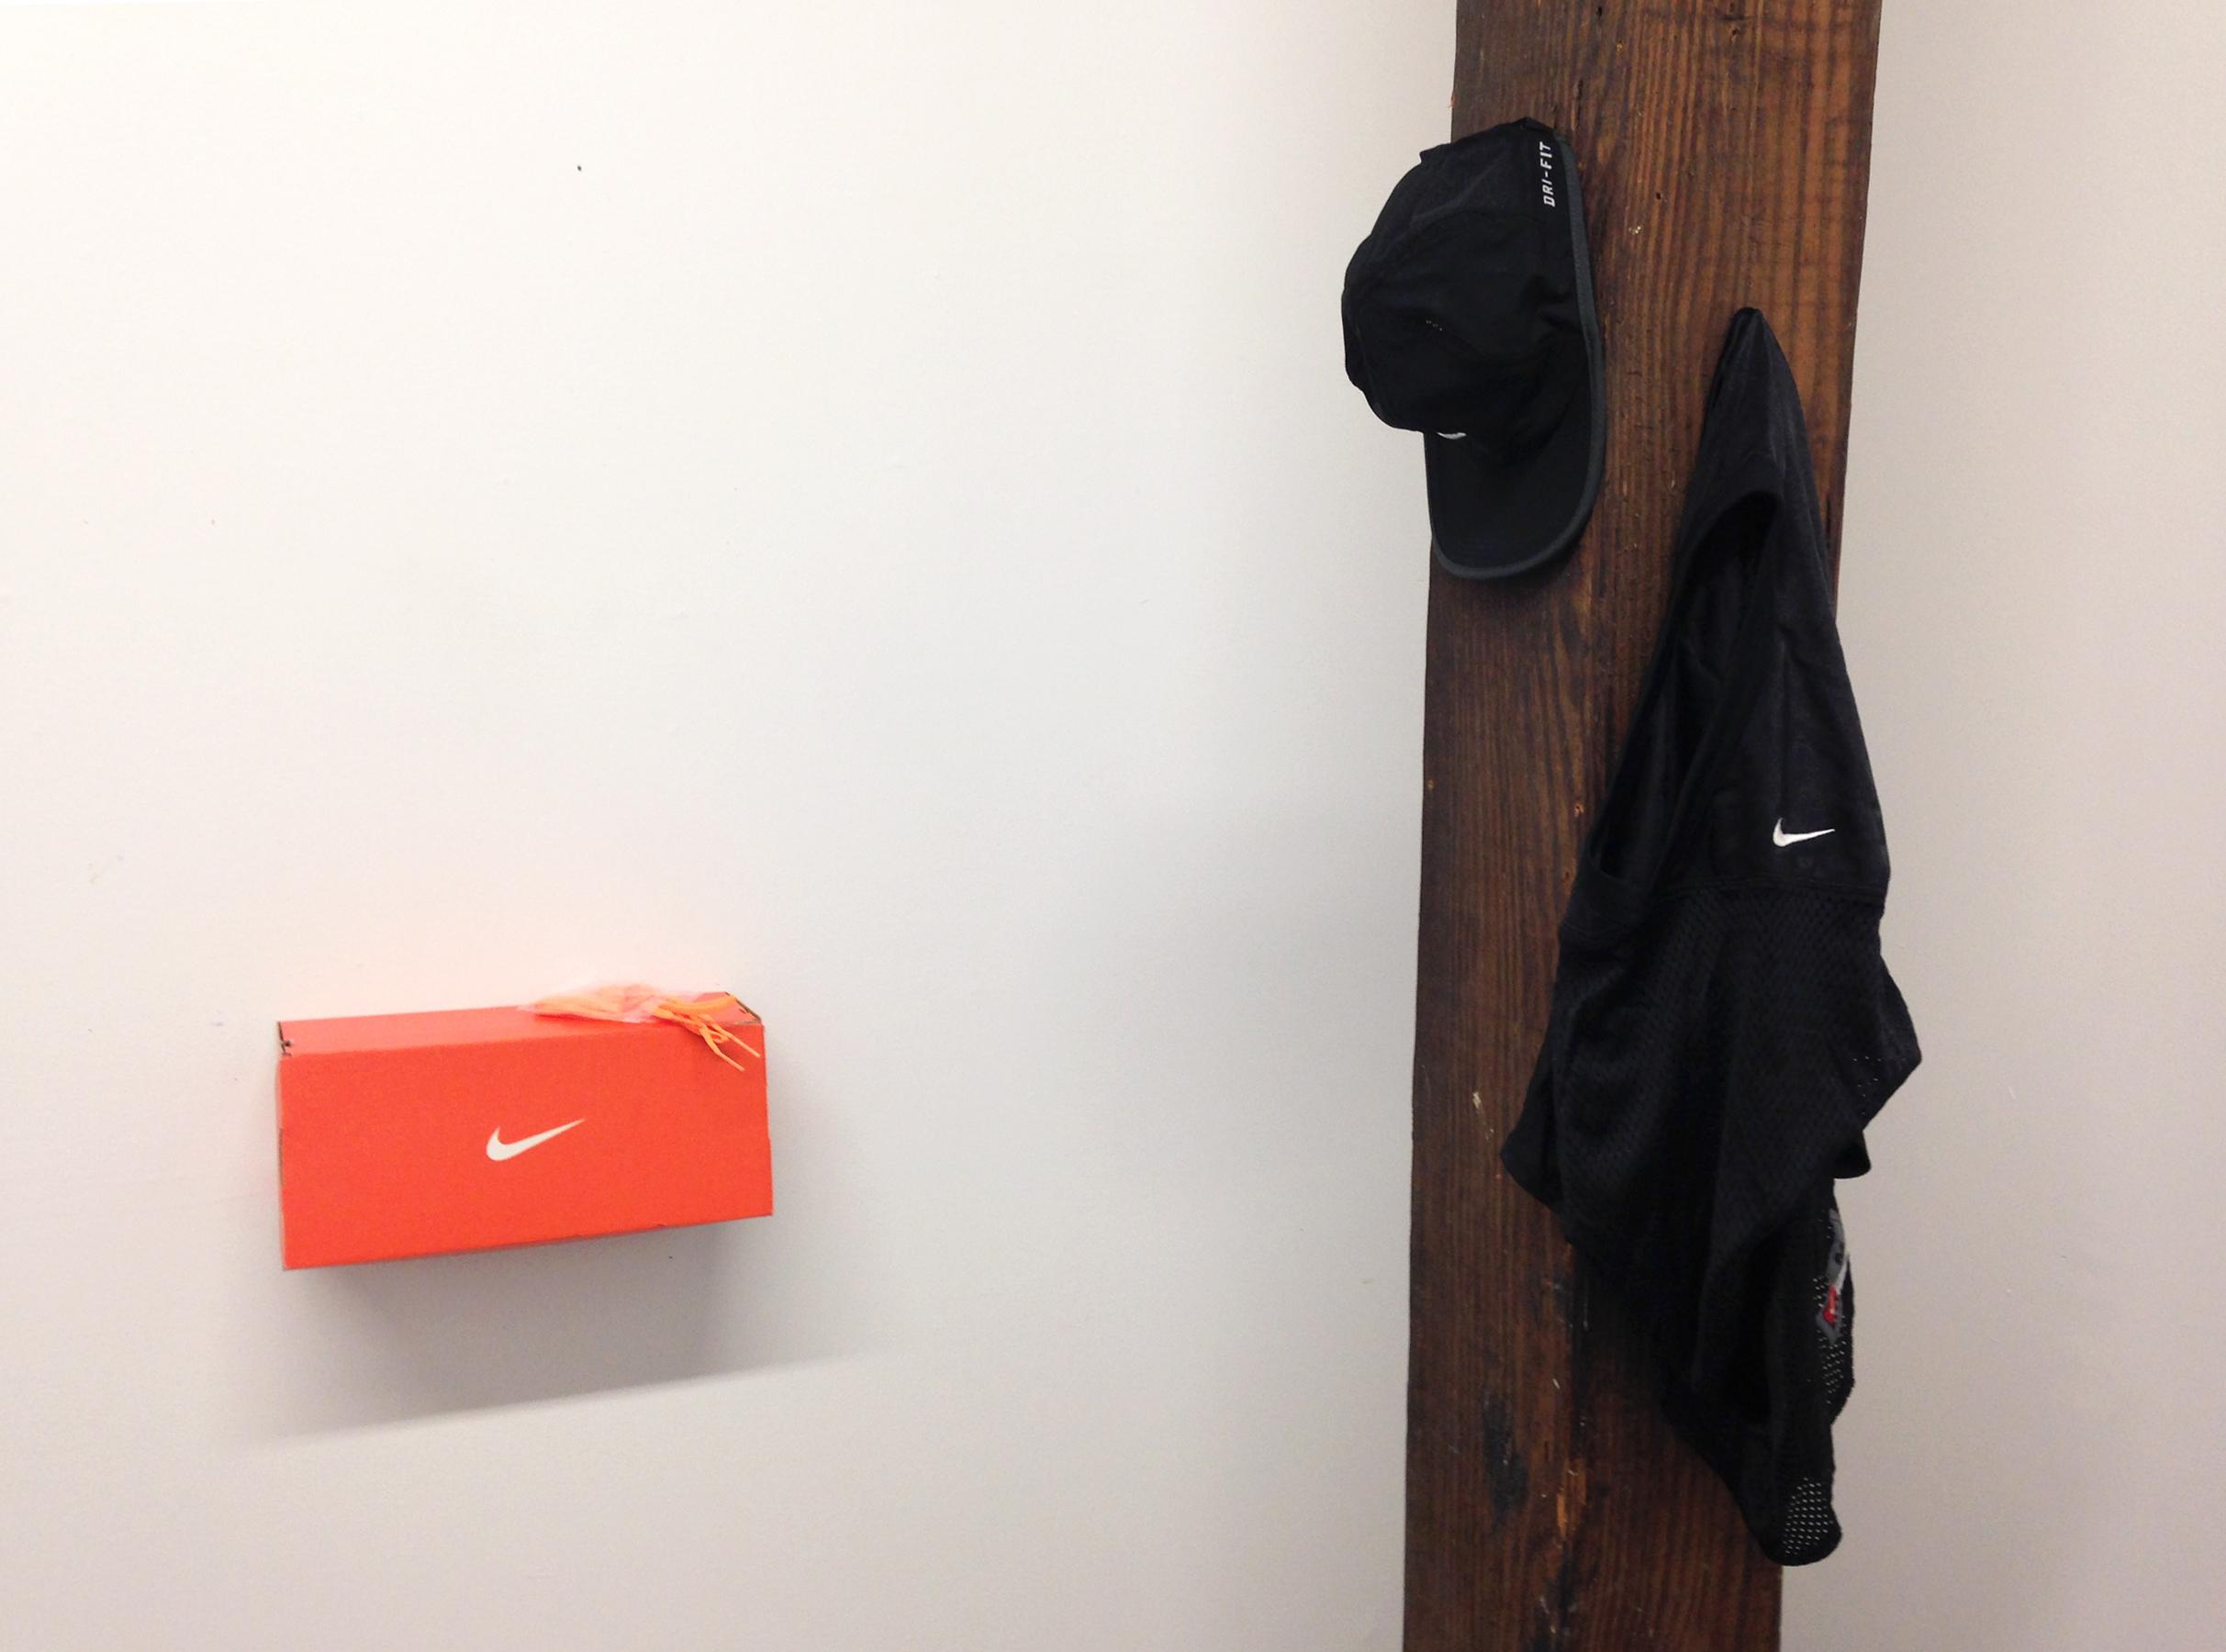 Nike Composition , Nike Boys' Jersey, Nike Dri-FIT hat, Nike shoebox, adidas laces, 2015